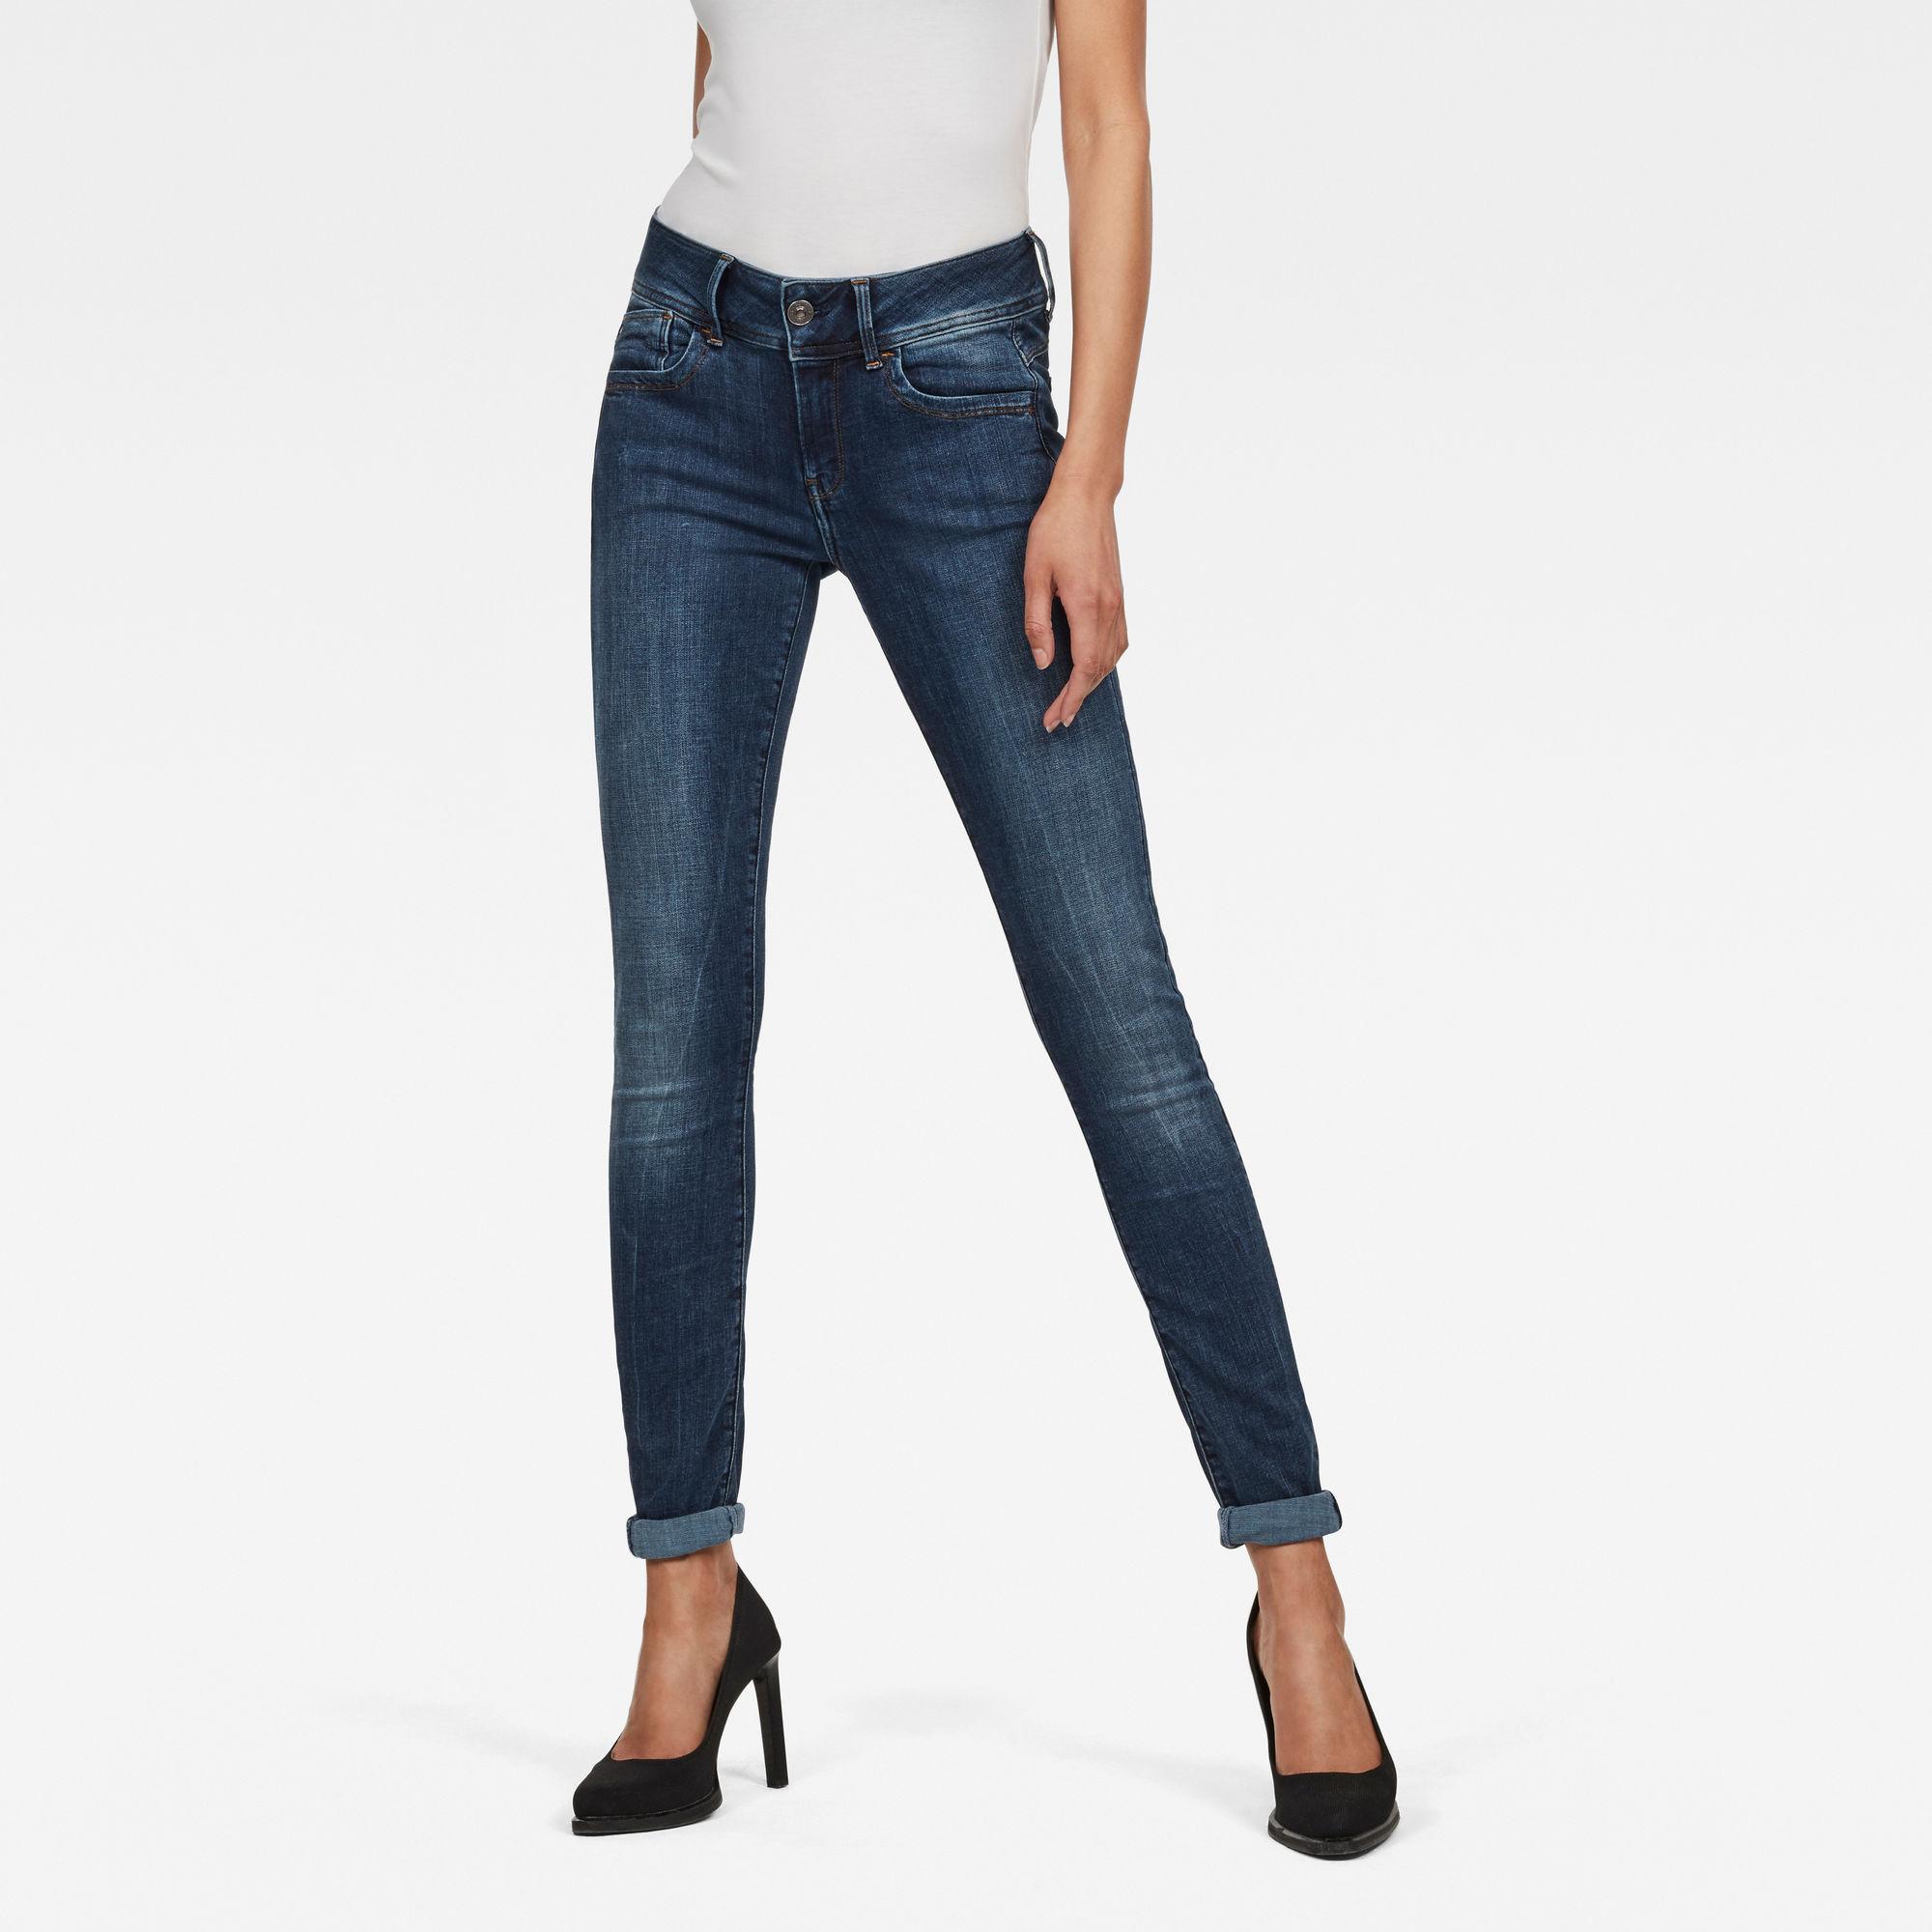 Image of G Star Raw Lynn D-Mid Waist Super SkinnyJeans